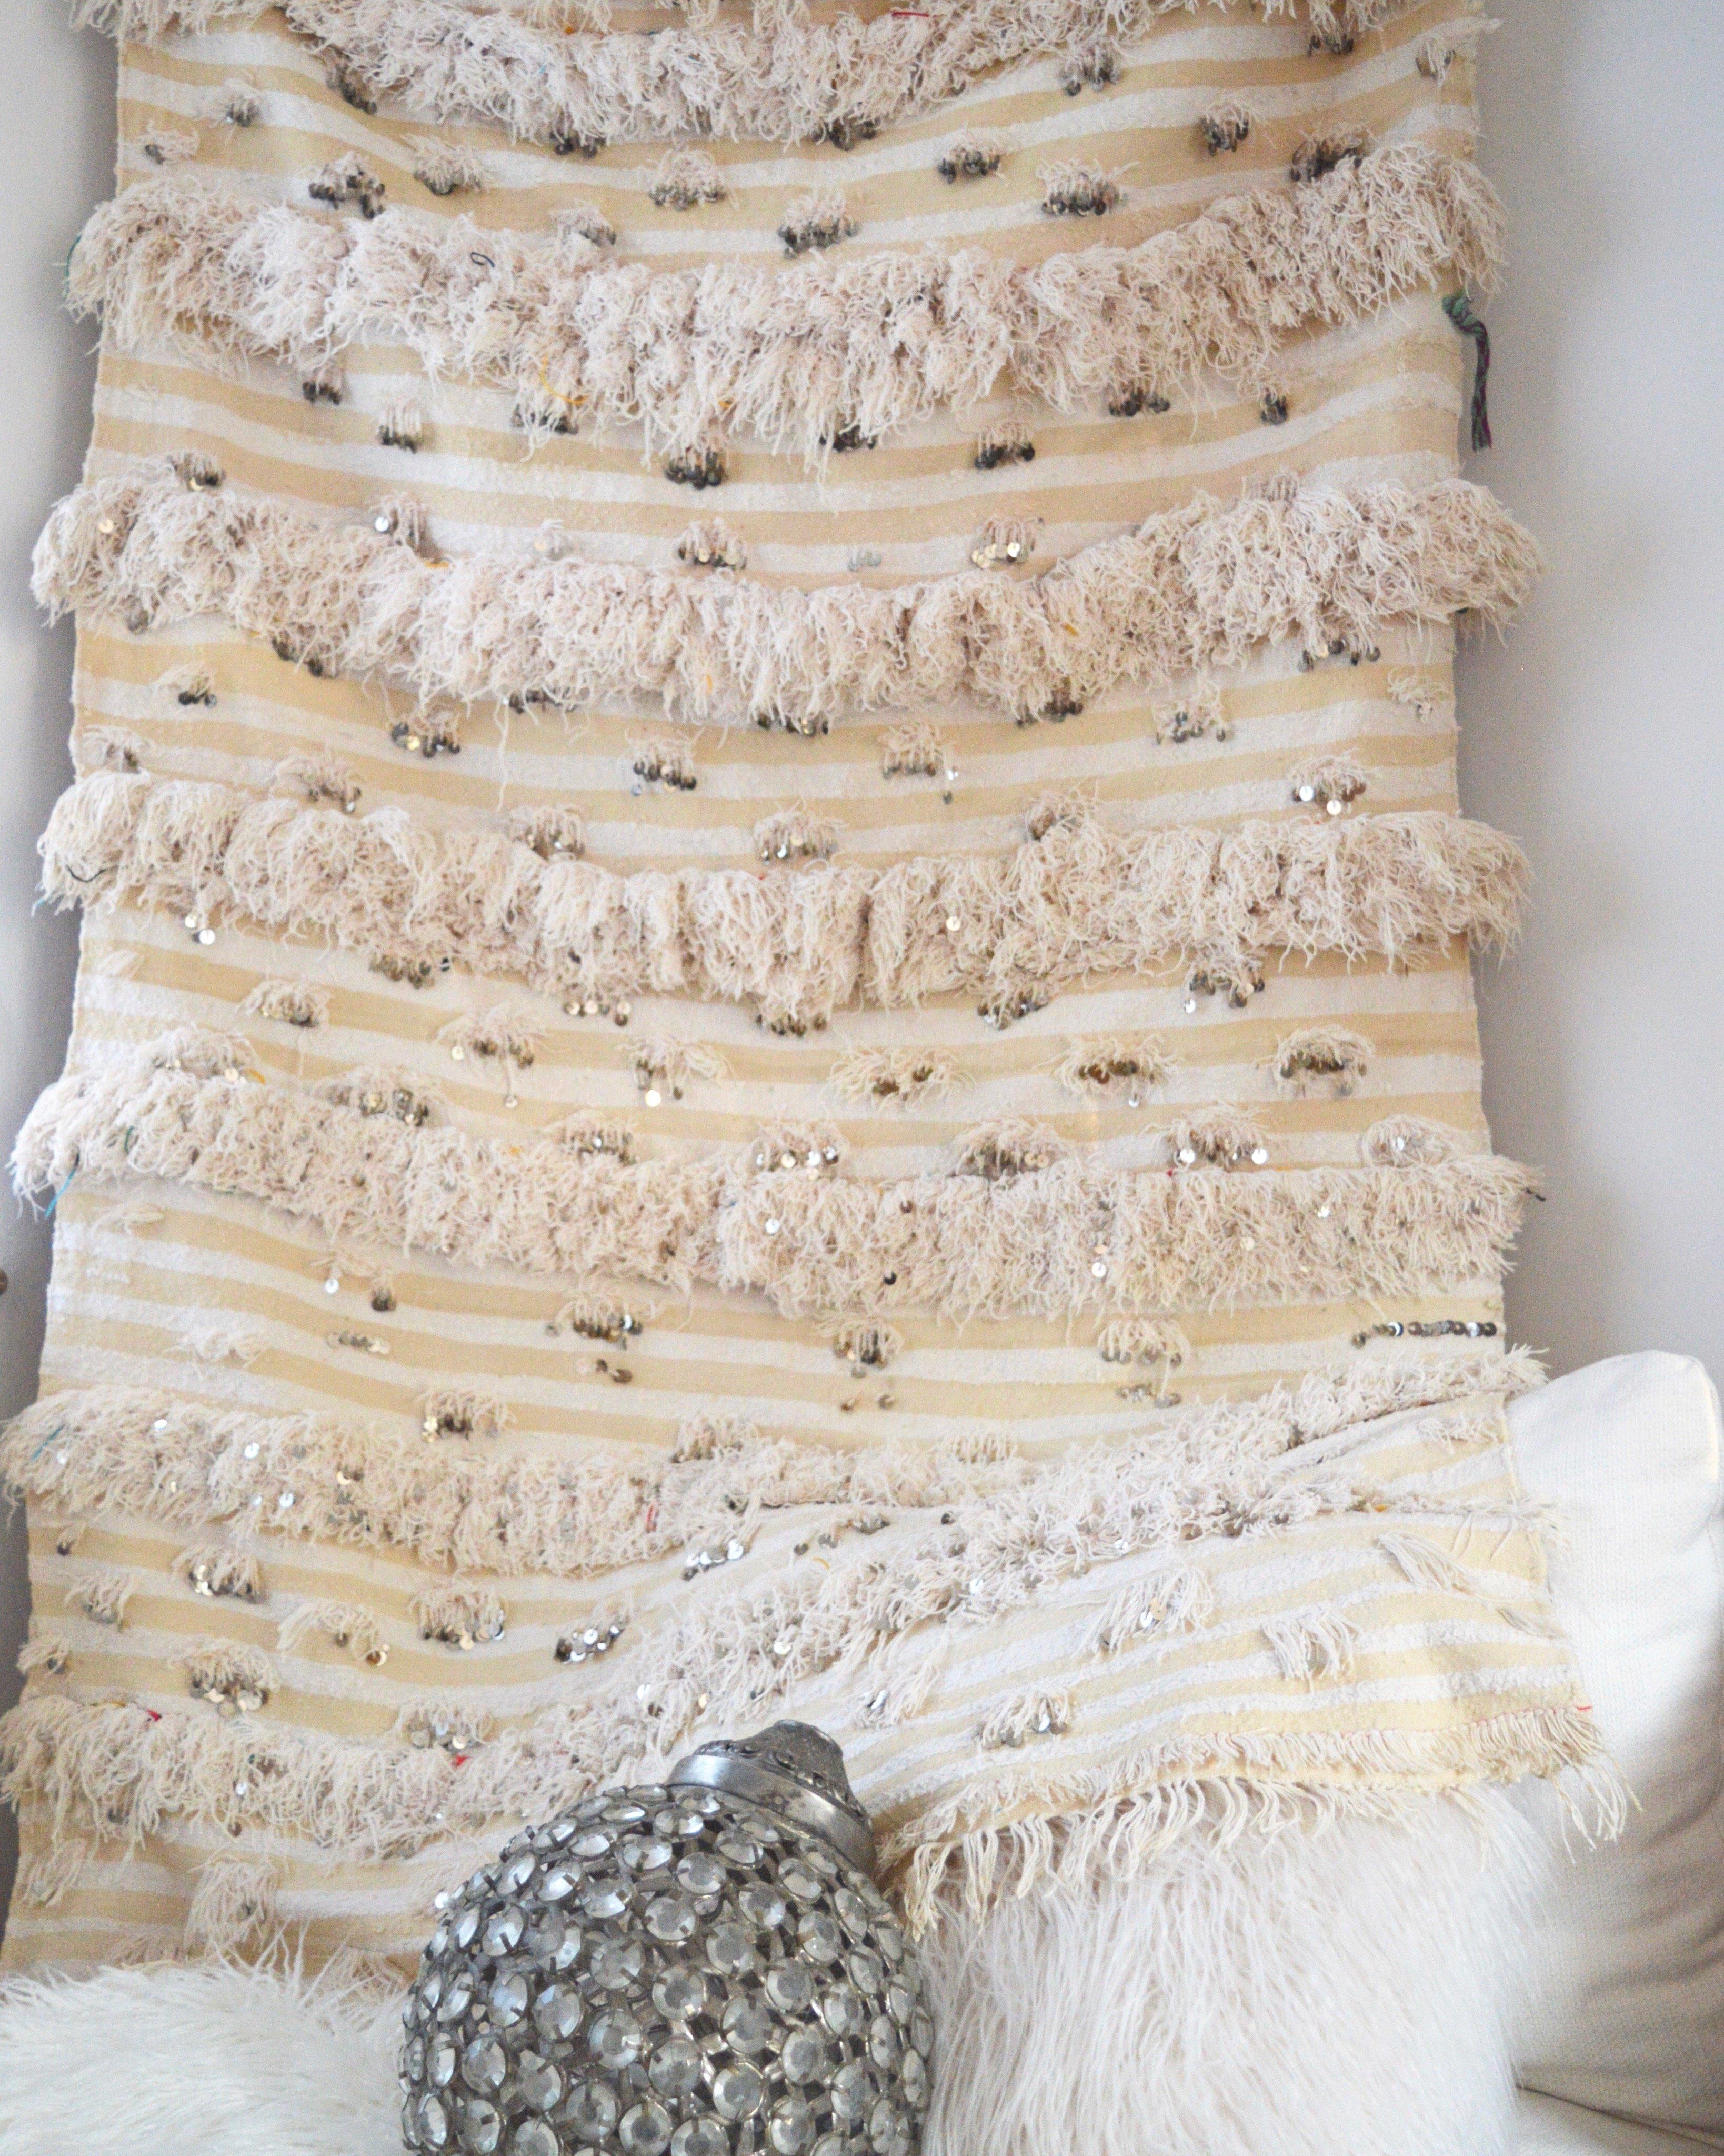 Moroccan Wedding Blanket.Vintage Moroccan Wedding Blanket Throw